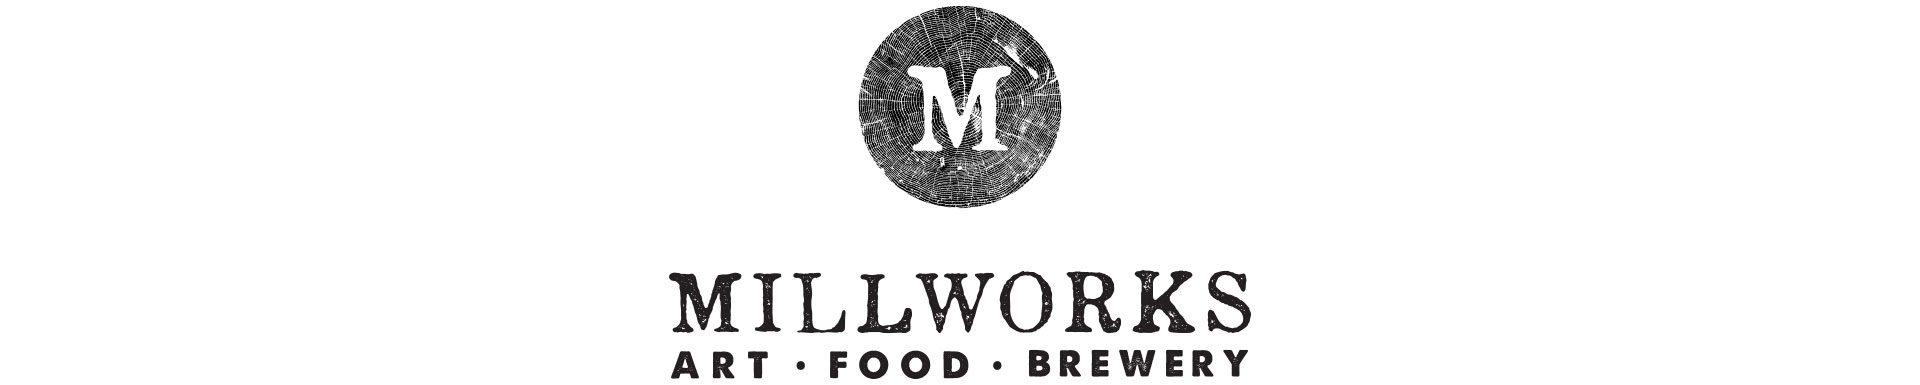 Millworks